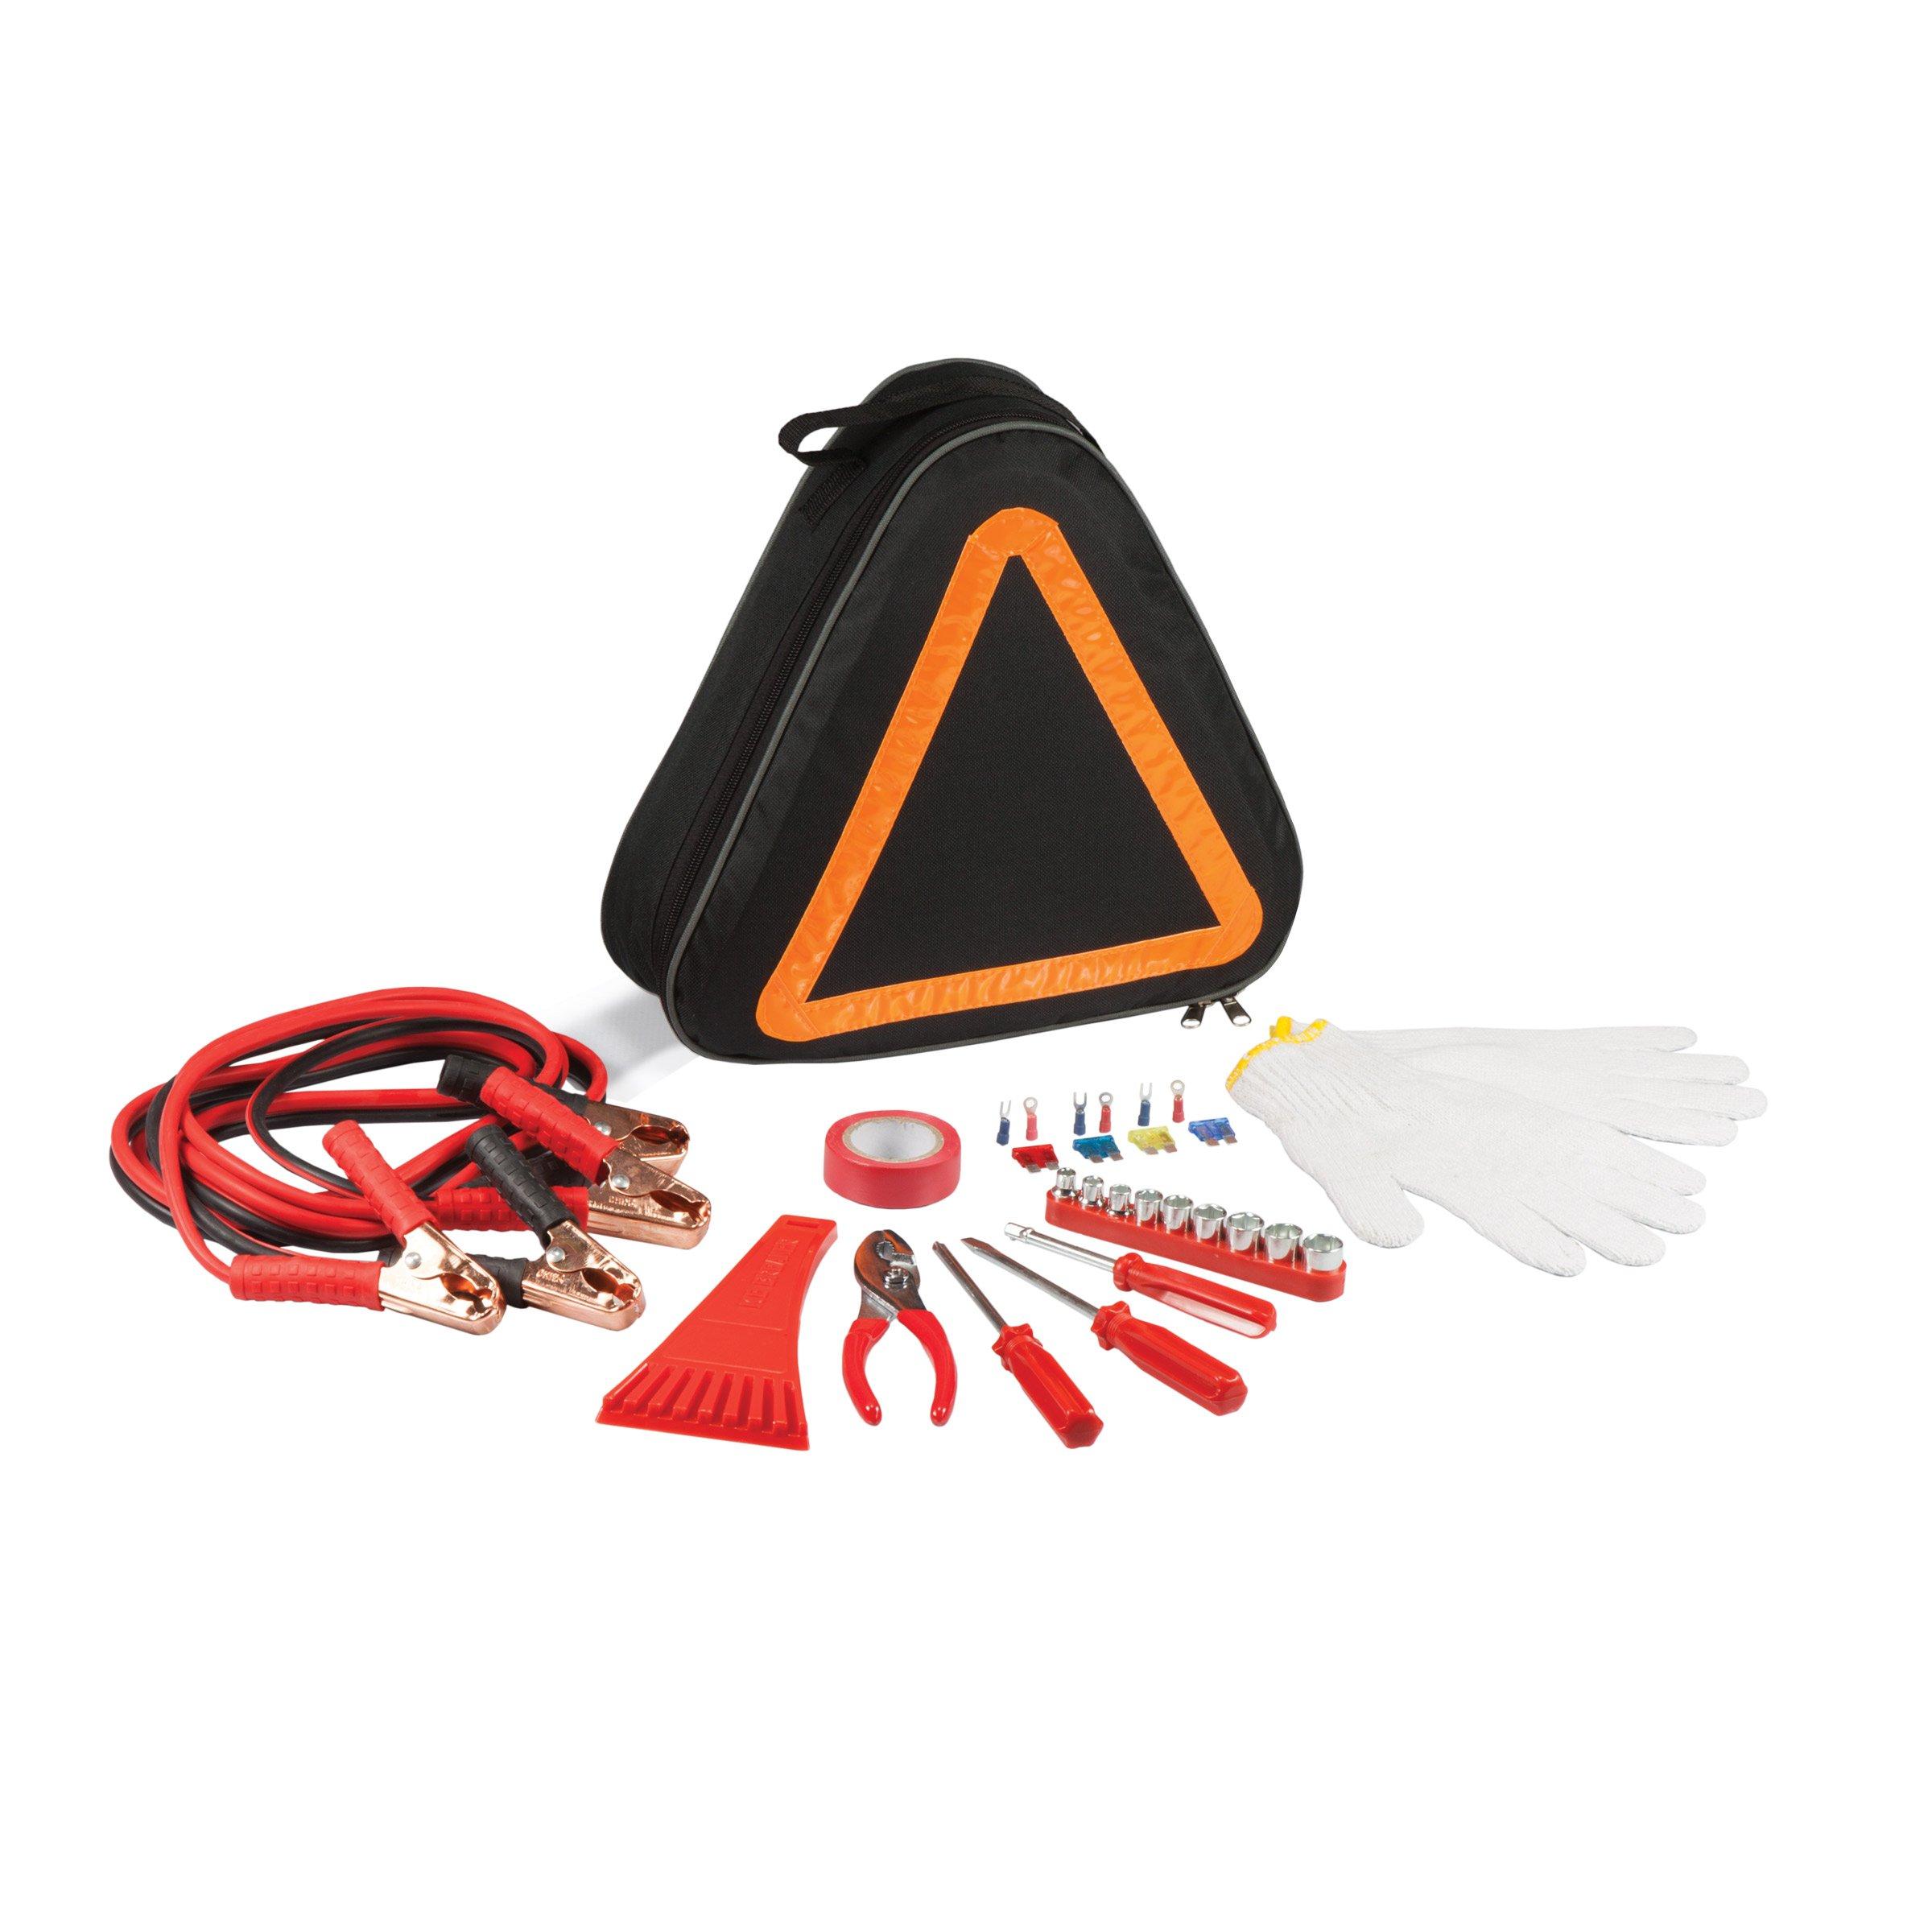 ONIVA - a Picnic Time Brand Roadside Emergency Auto Tool Kit